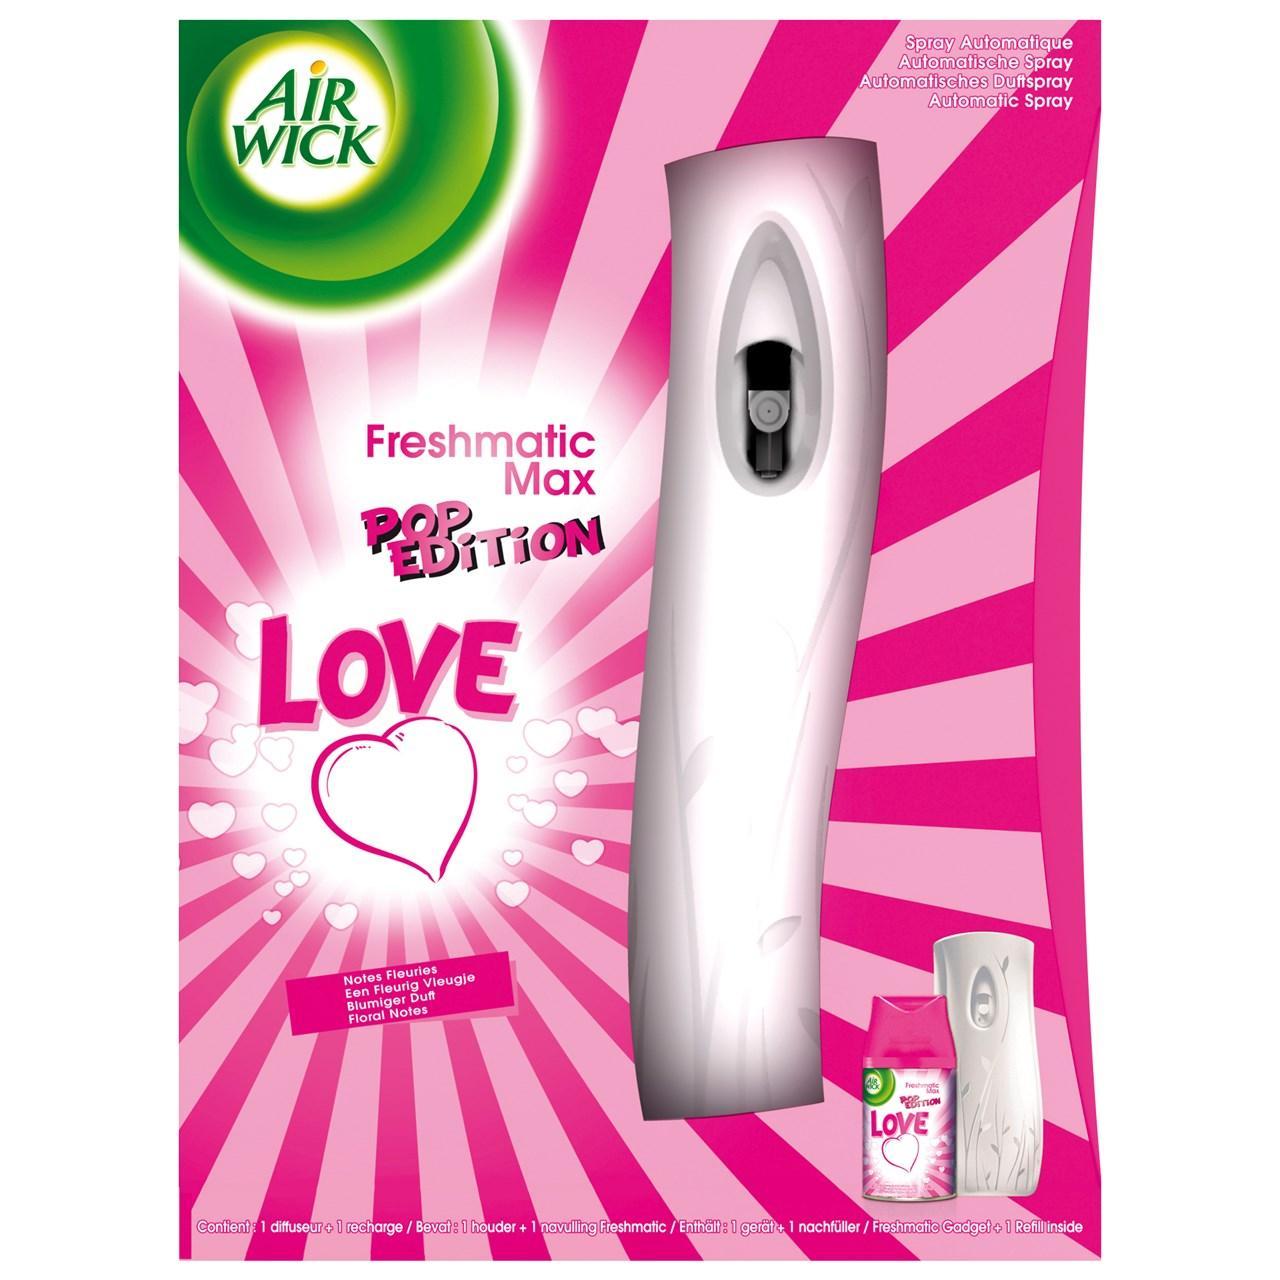 Diffuseur spray automatique Air Wick freshmatic max pop edition